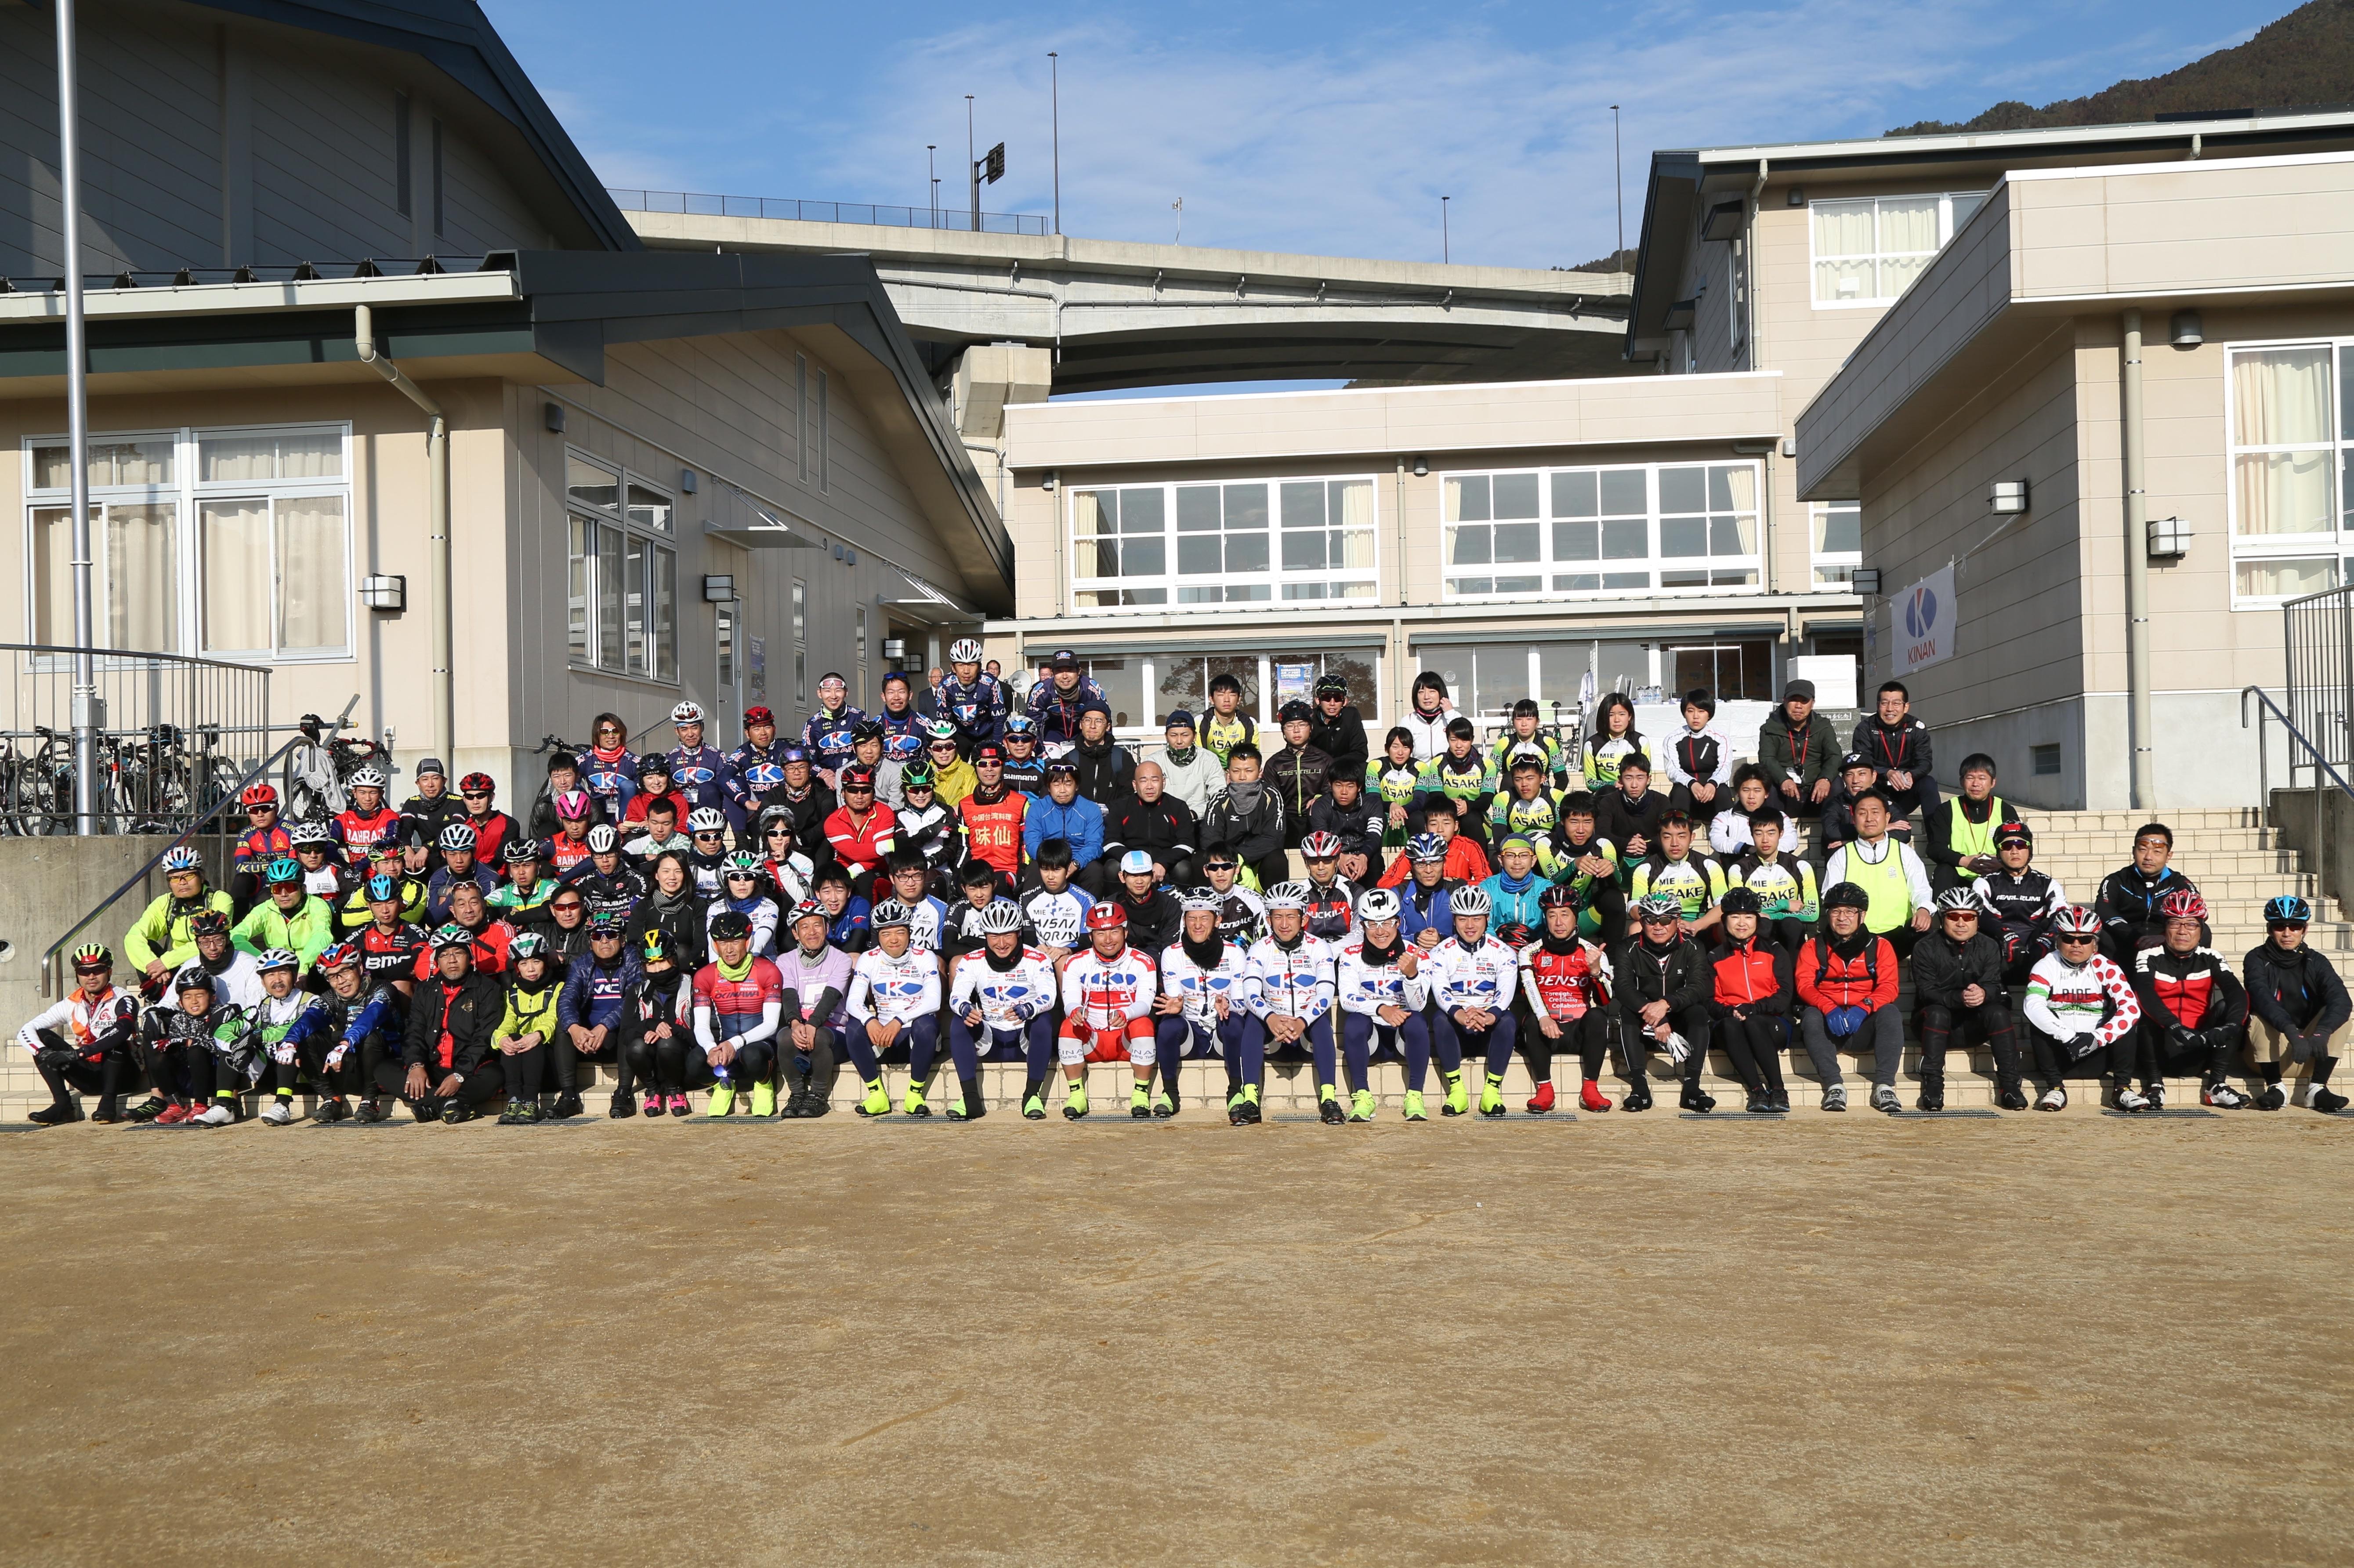 f:id:tatsuki_amagoi:20190207145937j:image